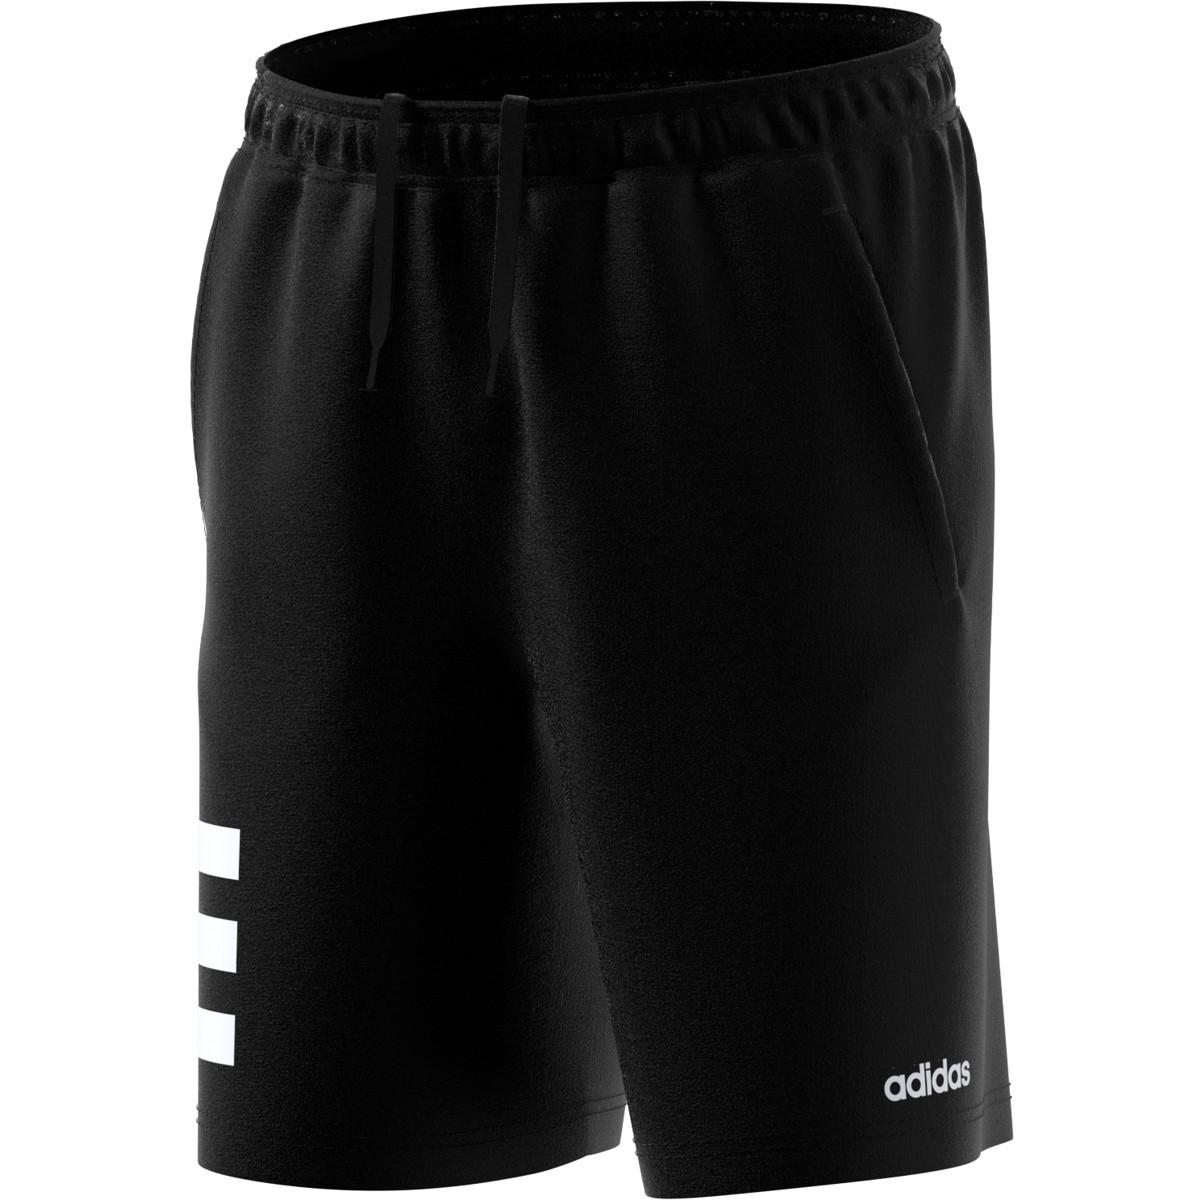 Adidas 3S Short M BK